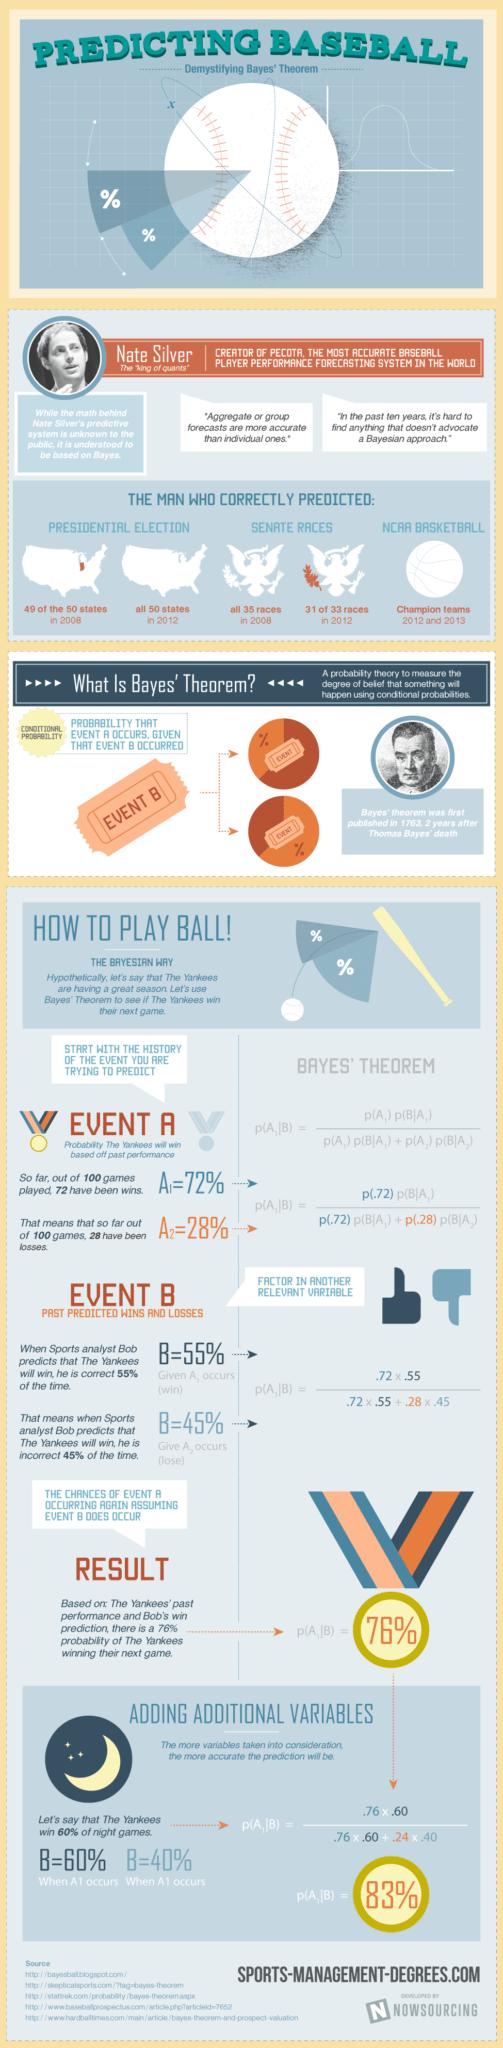 Predicting Baseball: Demystifying Bayes' Theorem